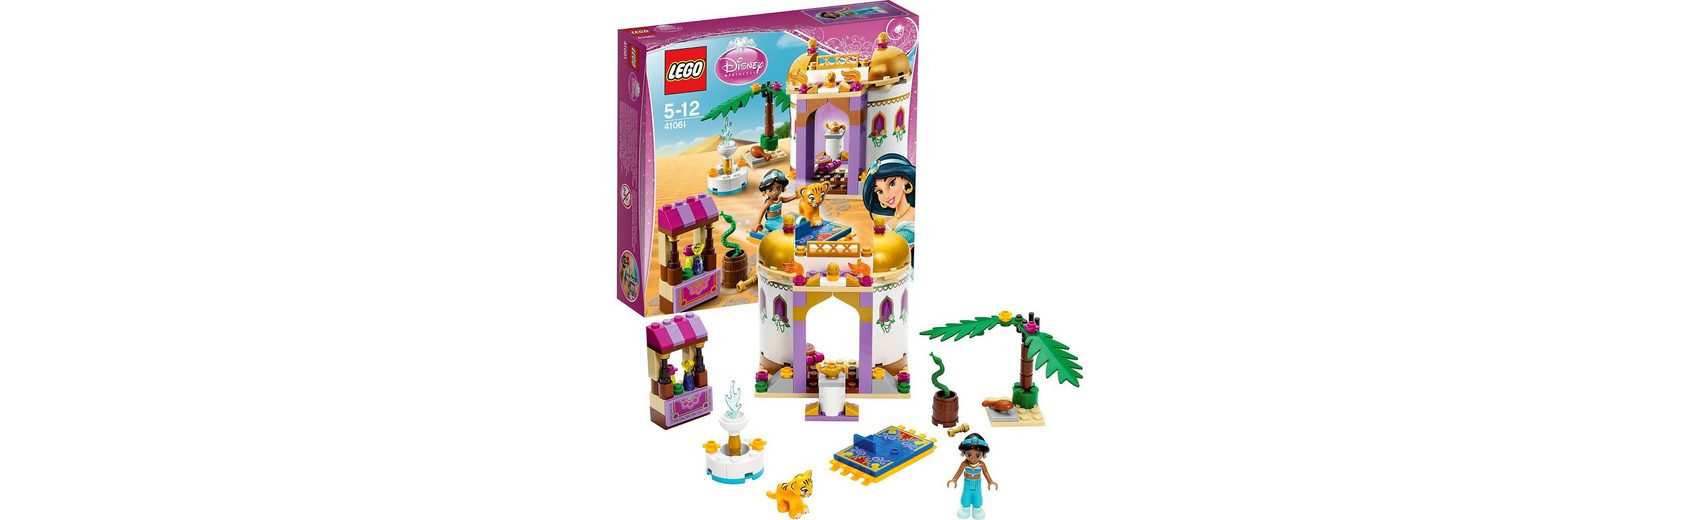 LEGO 41061 Disney Princess: Jasmins exotische Abenteuer